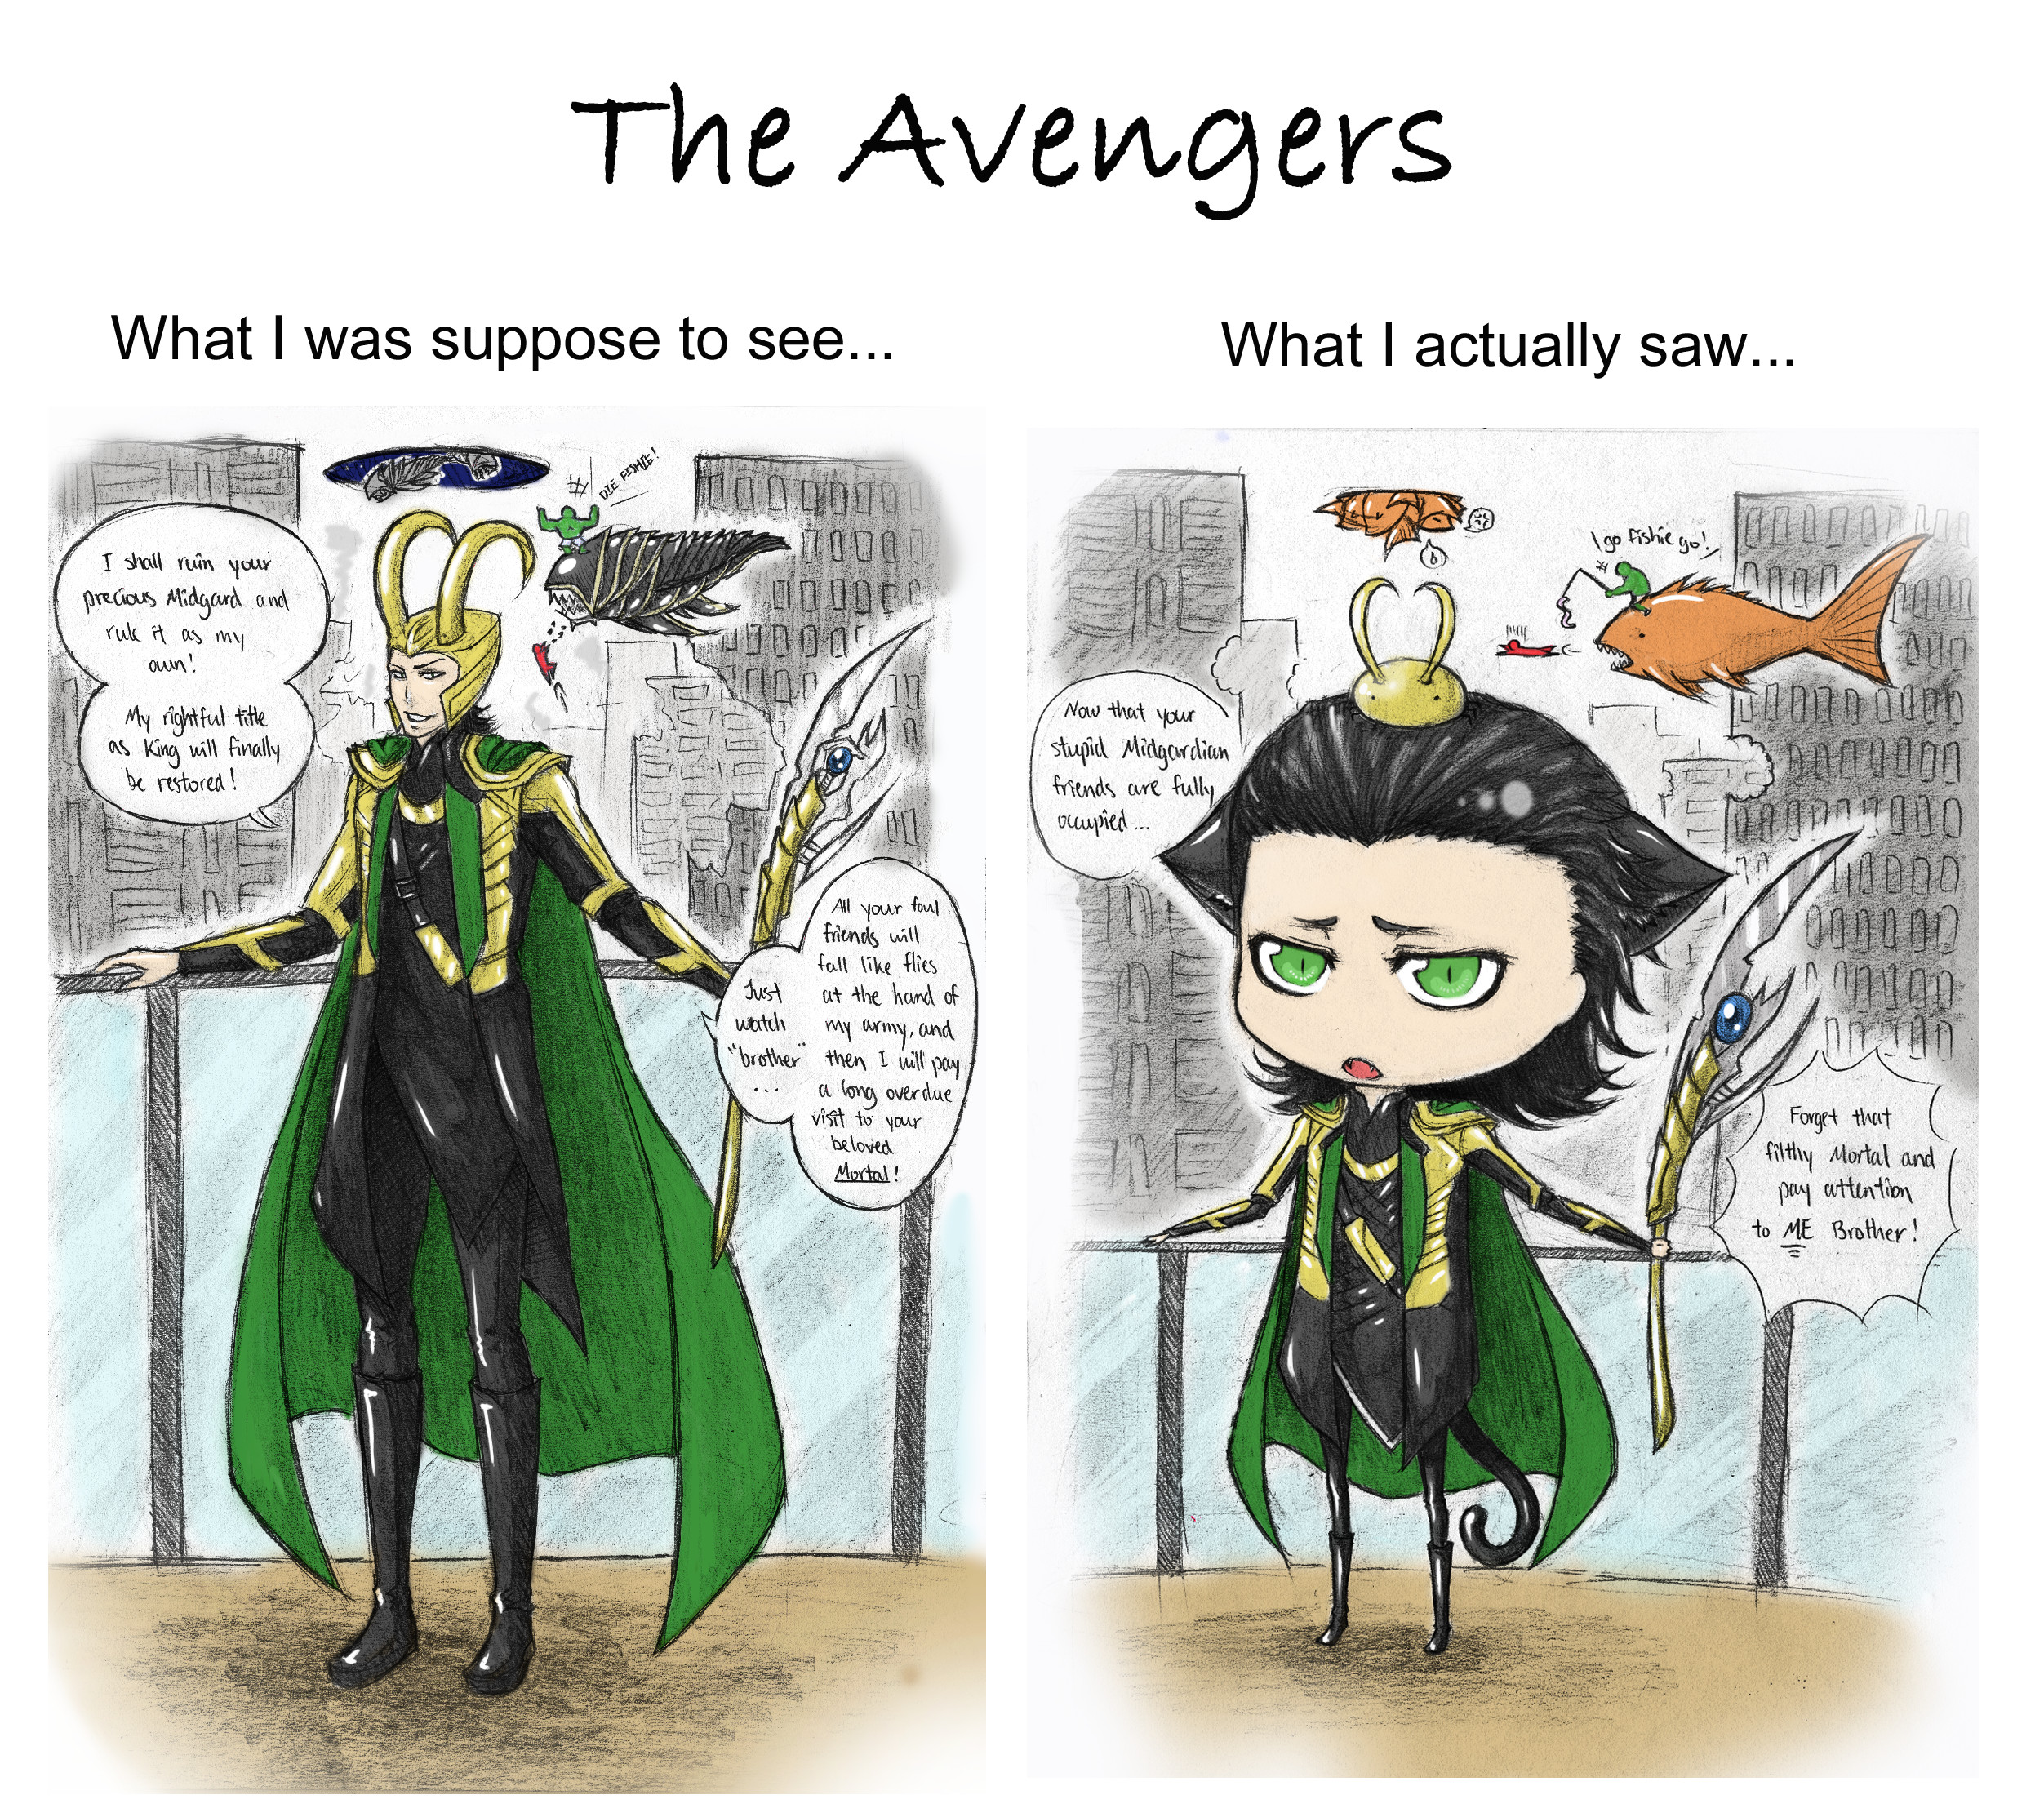 Loki favourites by RavenluvsSesshomaru on DeviantArt